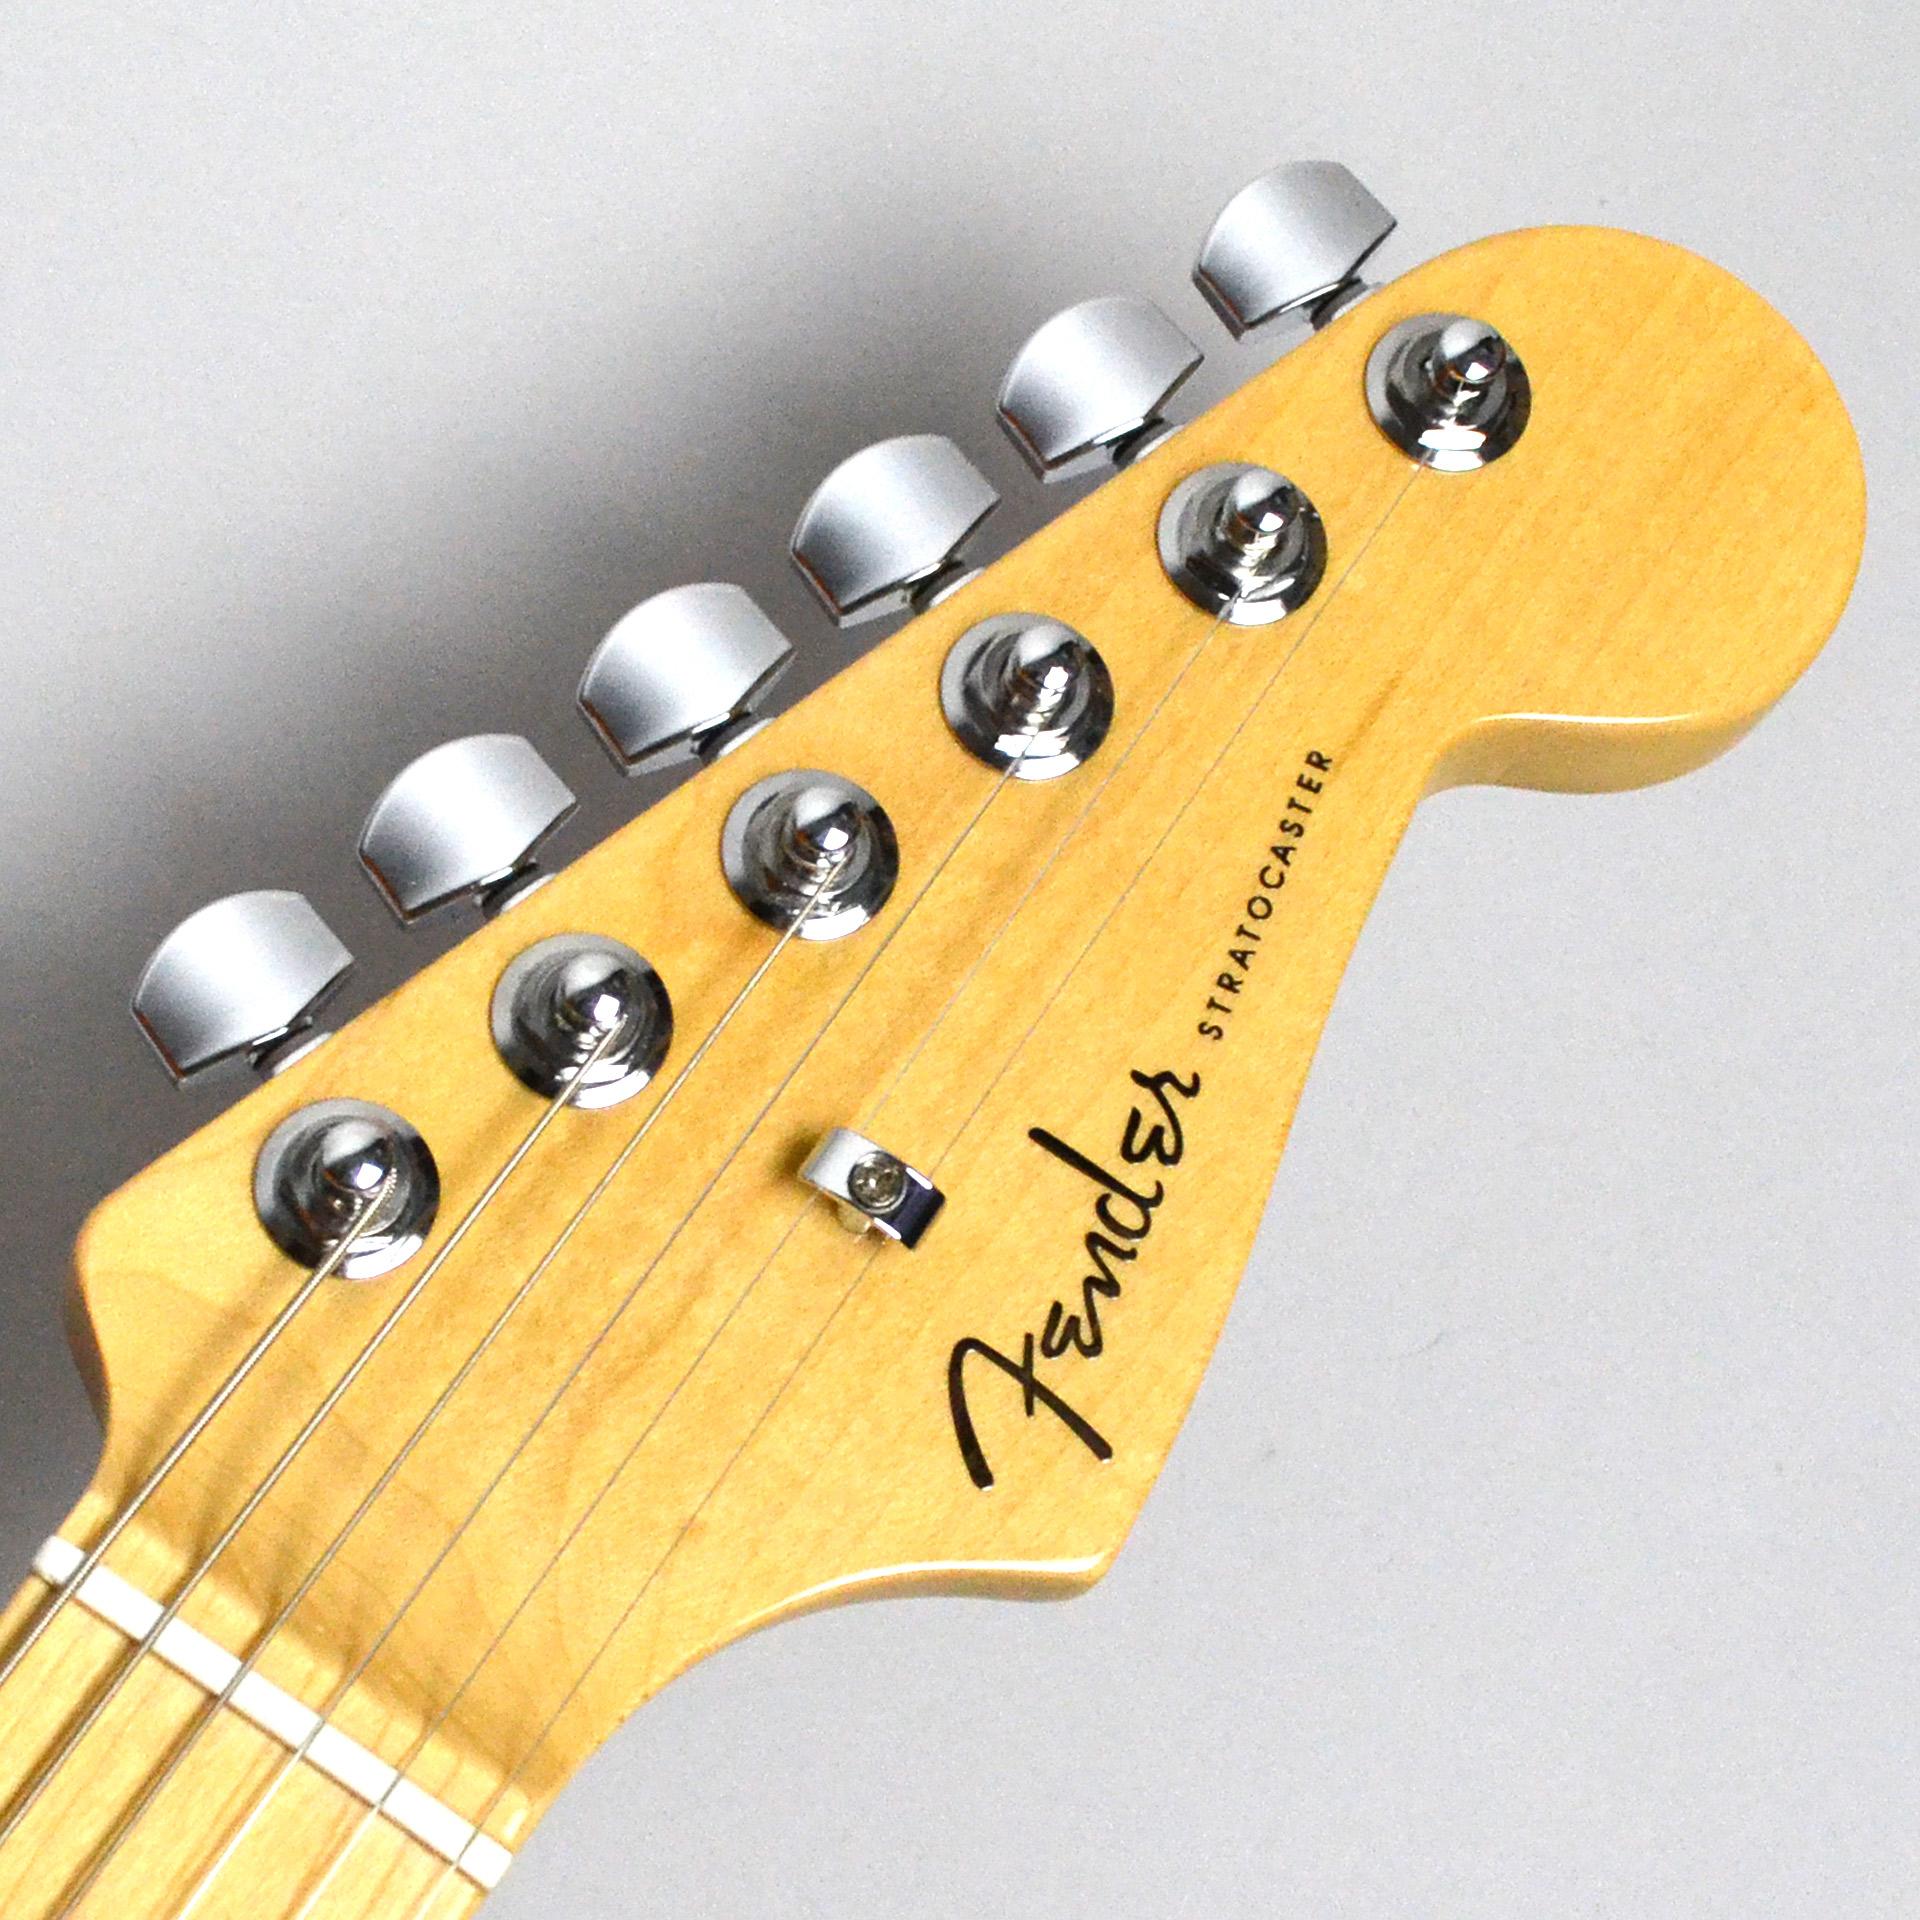 American Elite Stratocaster Maple Fretboard Autumn Blaze Metallic【USED】のヘッド画像